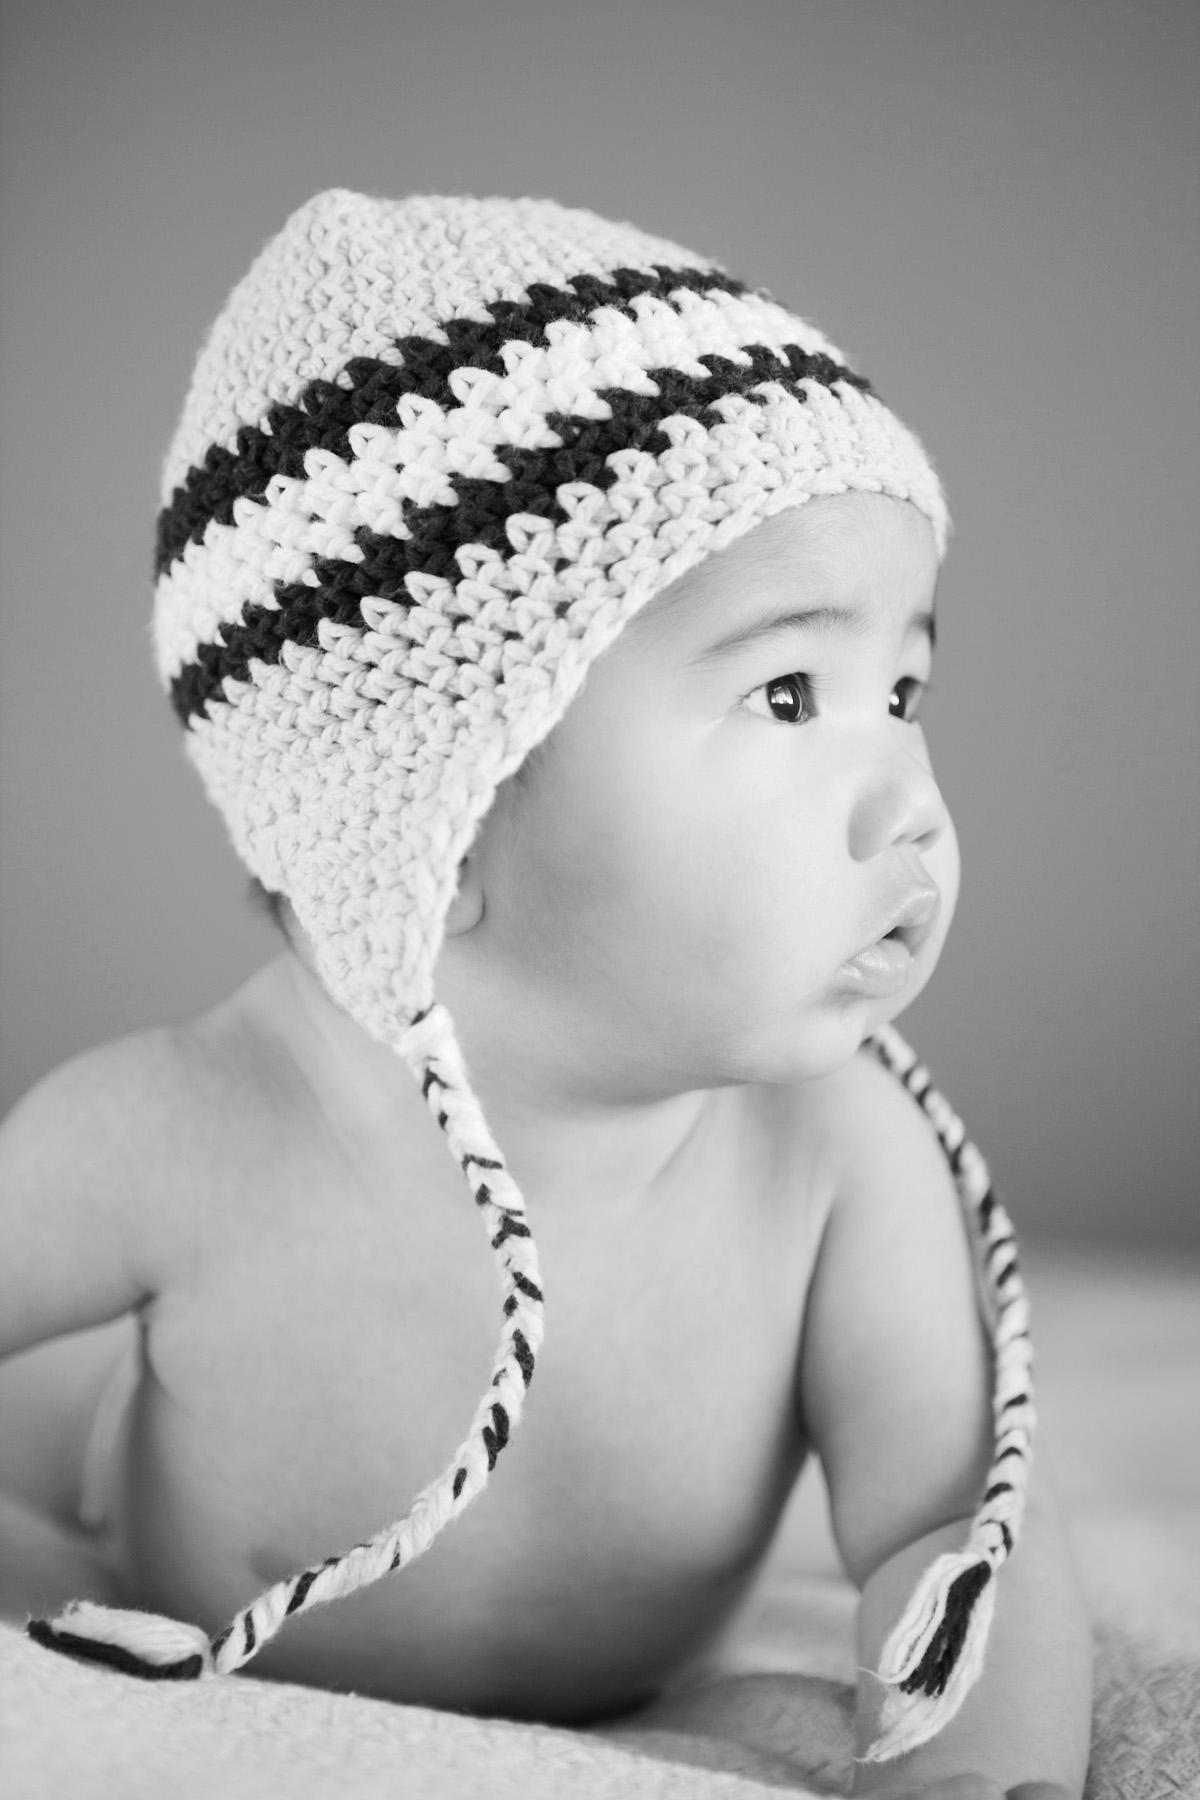 31_baby_website_images_baby_0043.jpg